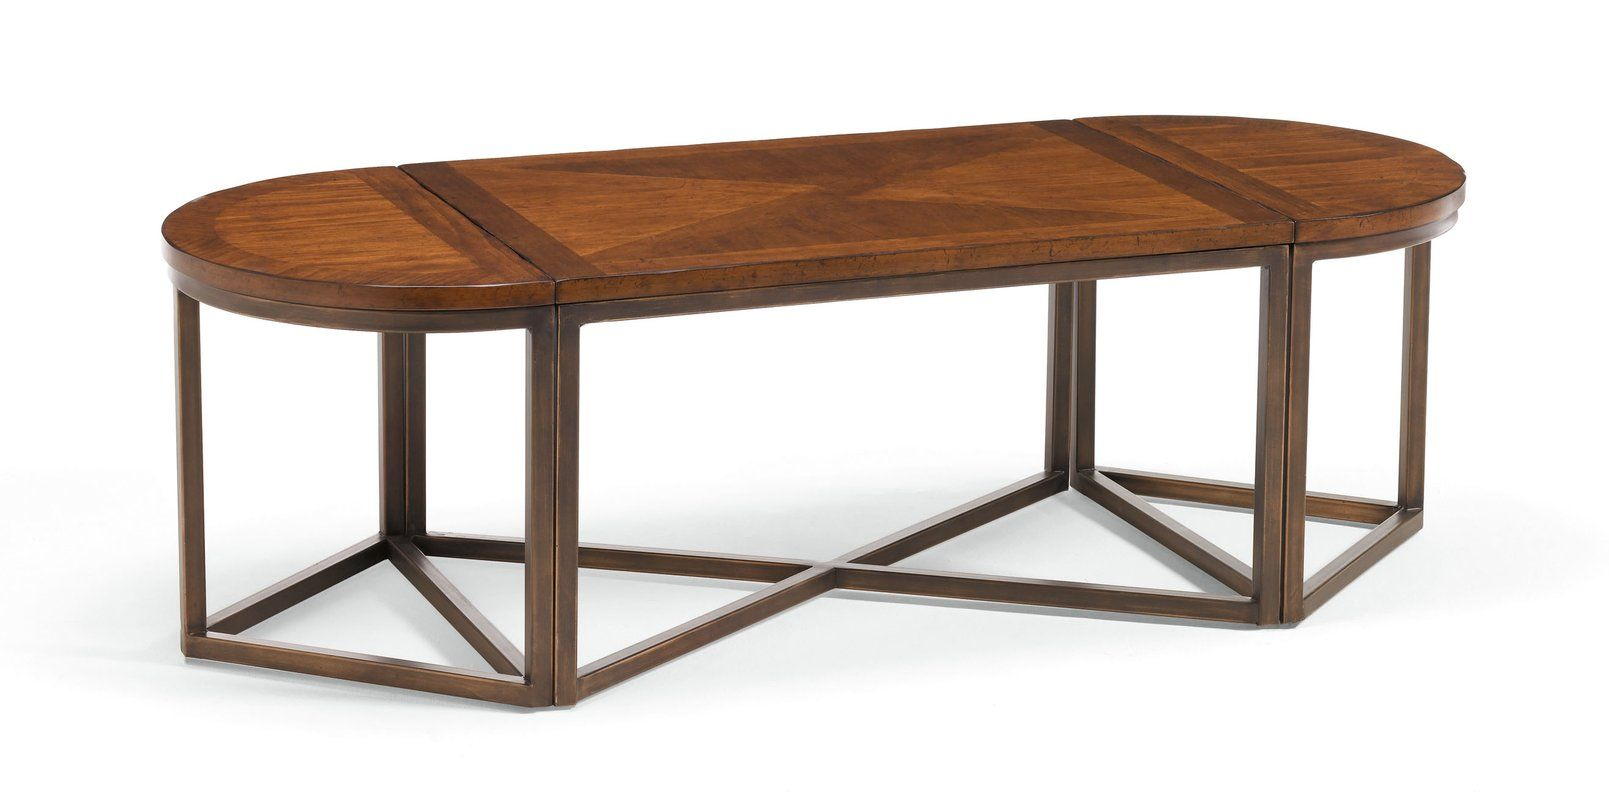 Francois Pine Coffee Table Pine Coffee Table Coffee Table Cool Coffee Tables [ 800 x 1609 Pixel ]